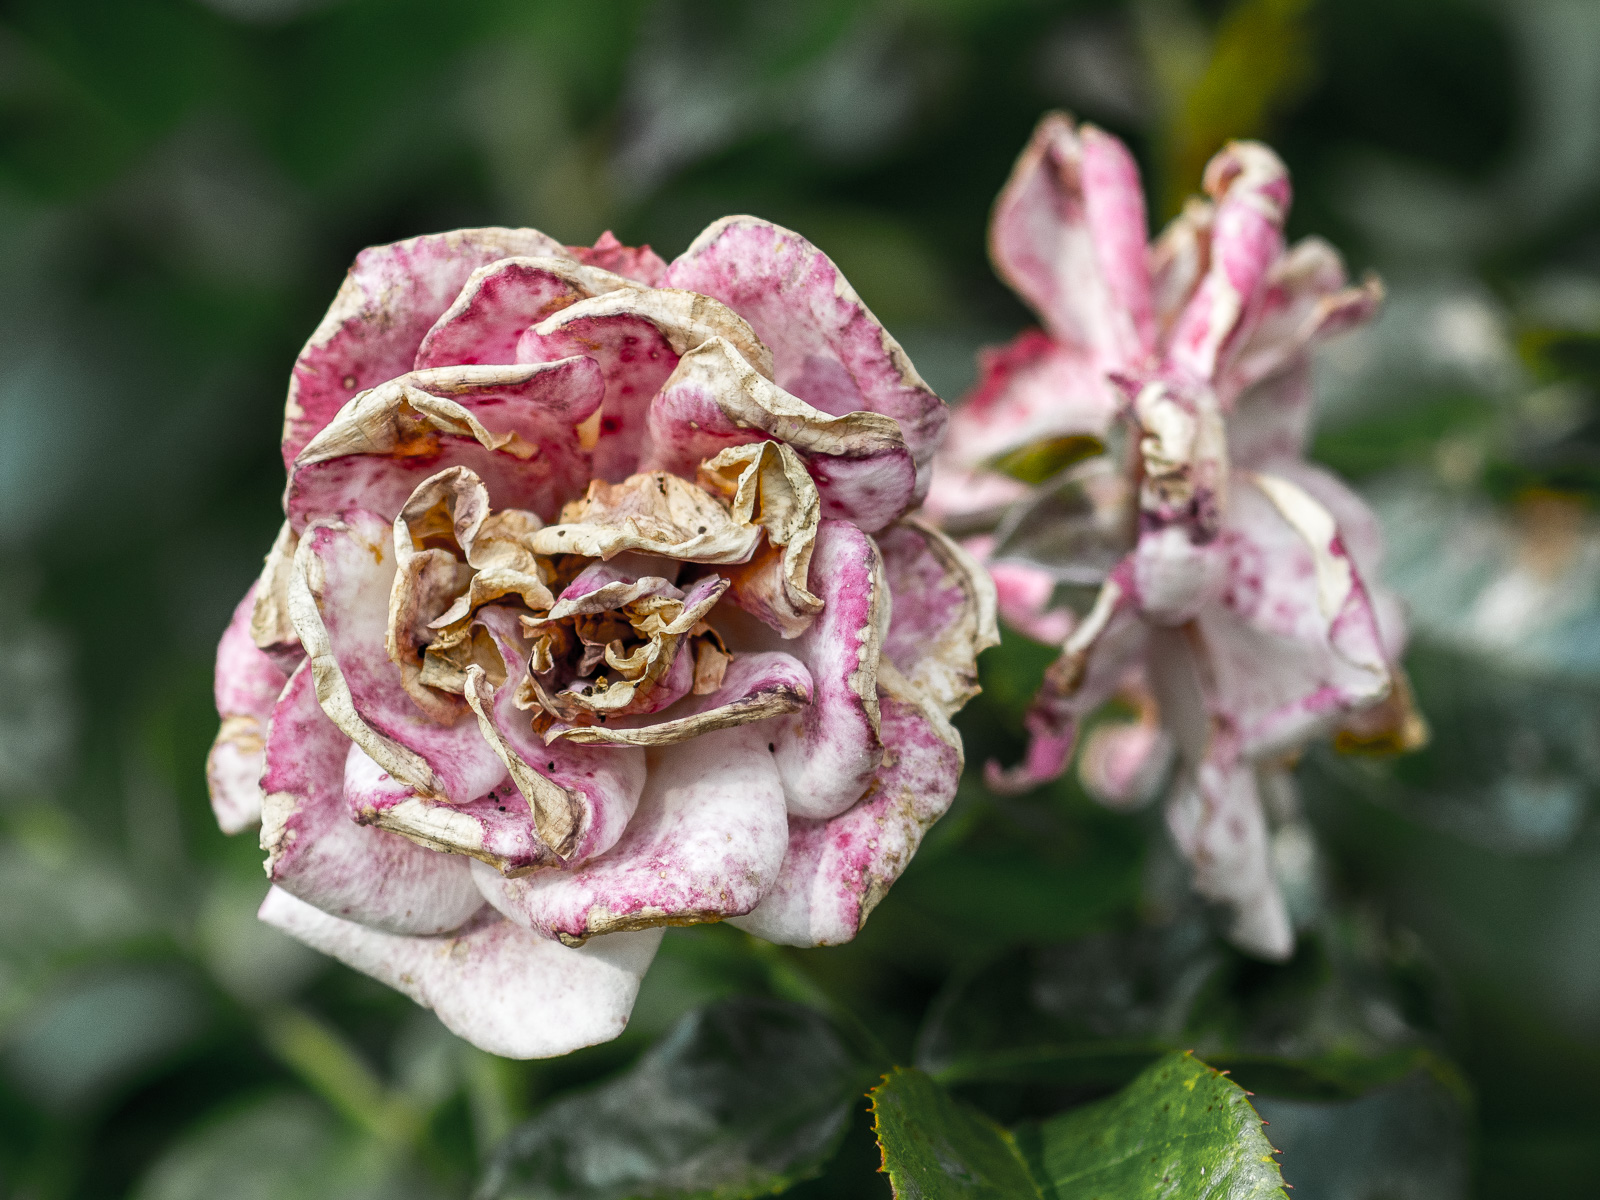 Rose, verblühend